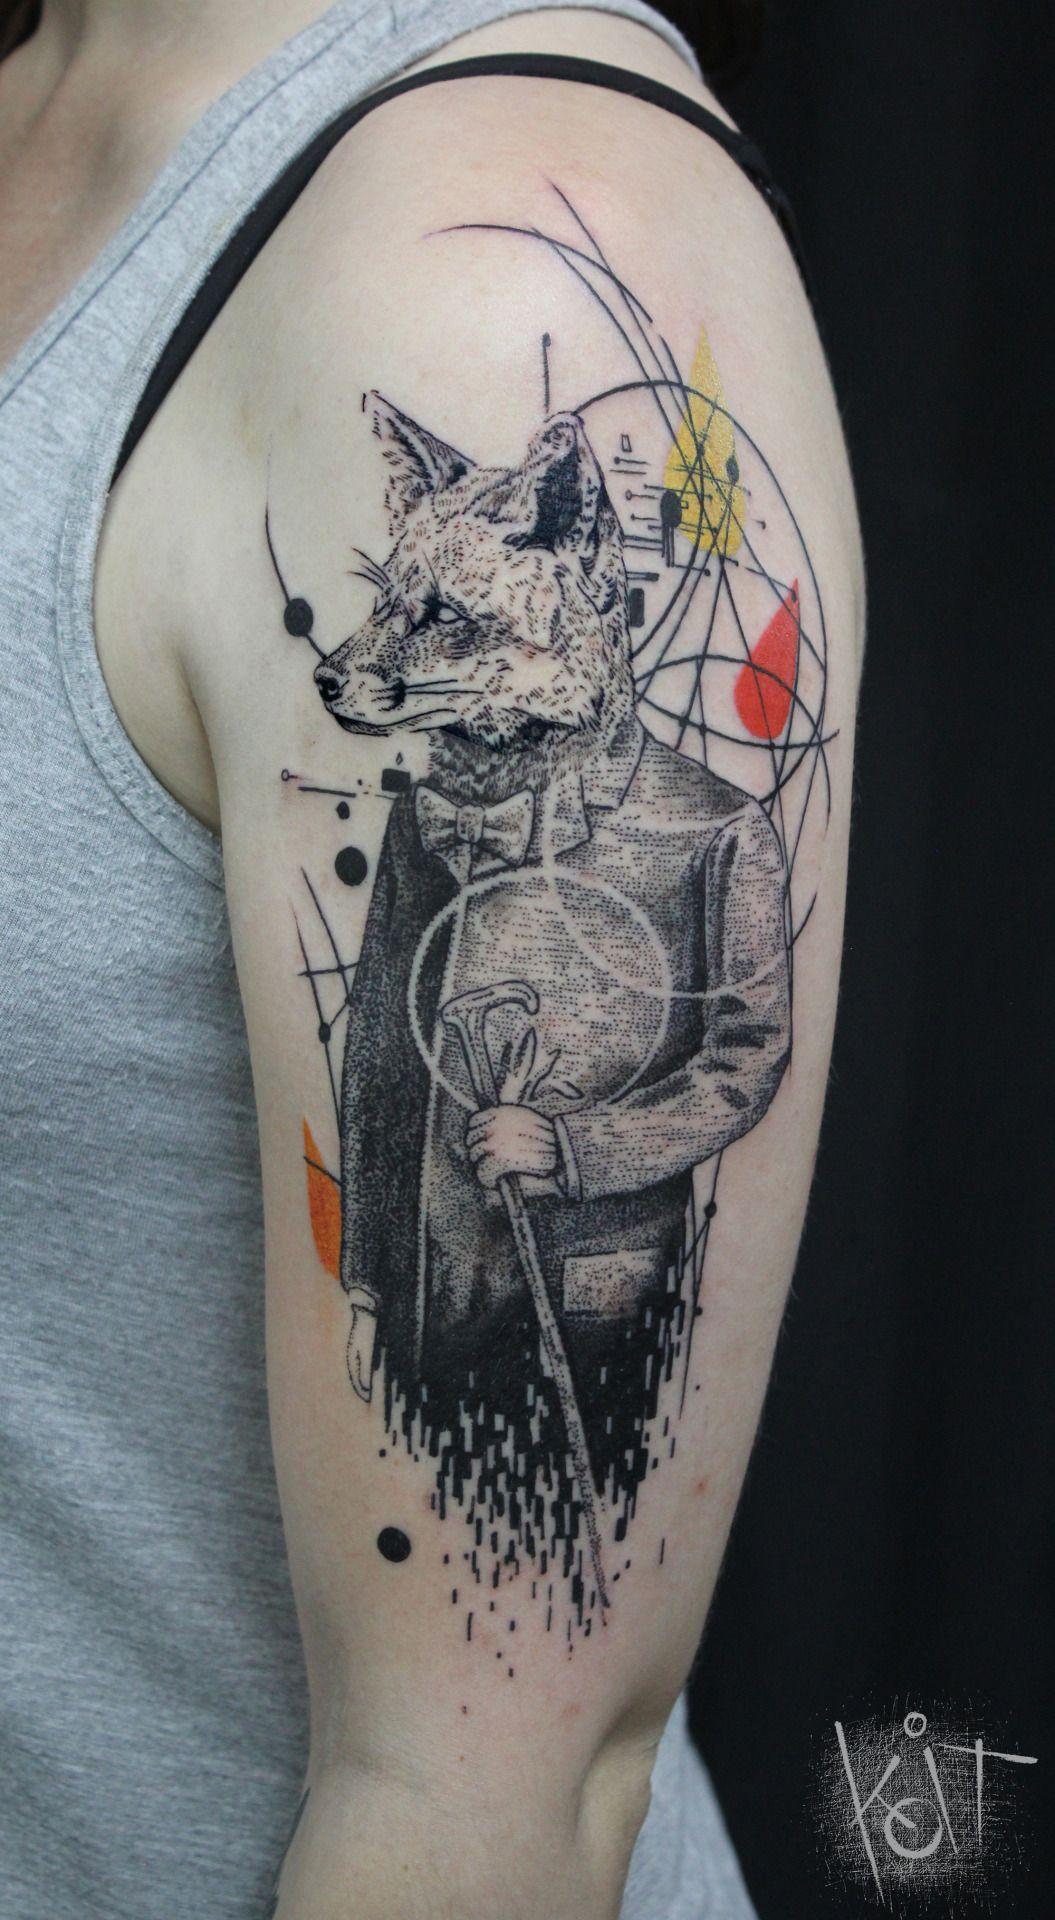 Graphic Style Fox Arm Tattoo By Koit Based In Berlin Travelling Fox Tattoo Tattoos Body Art Tattoos